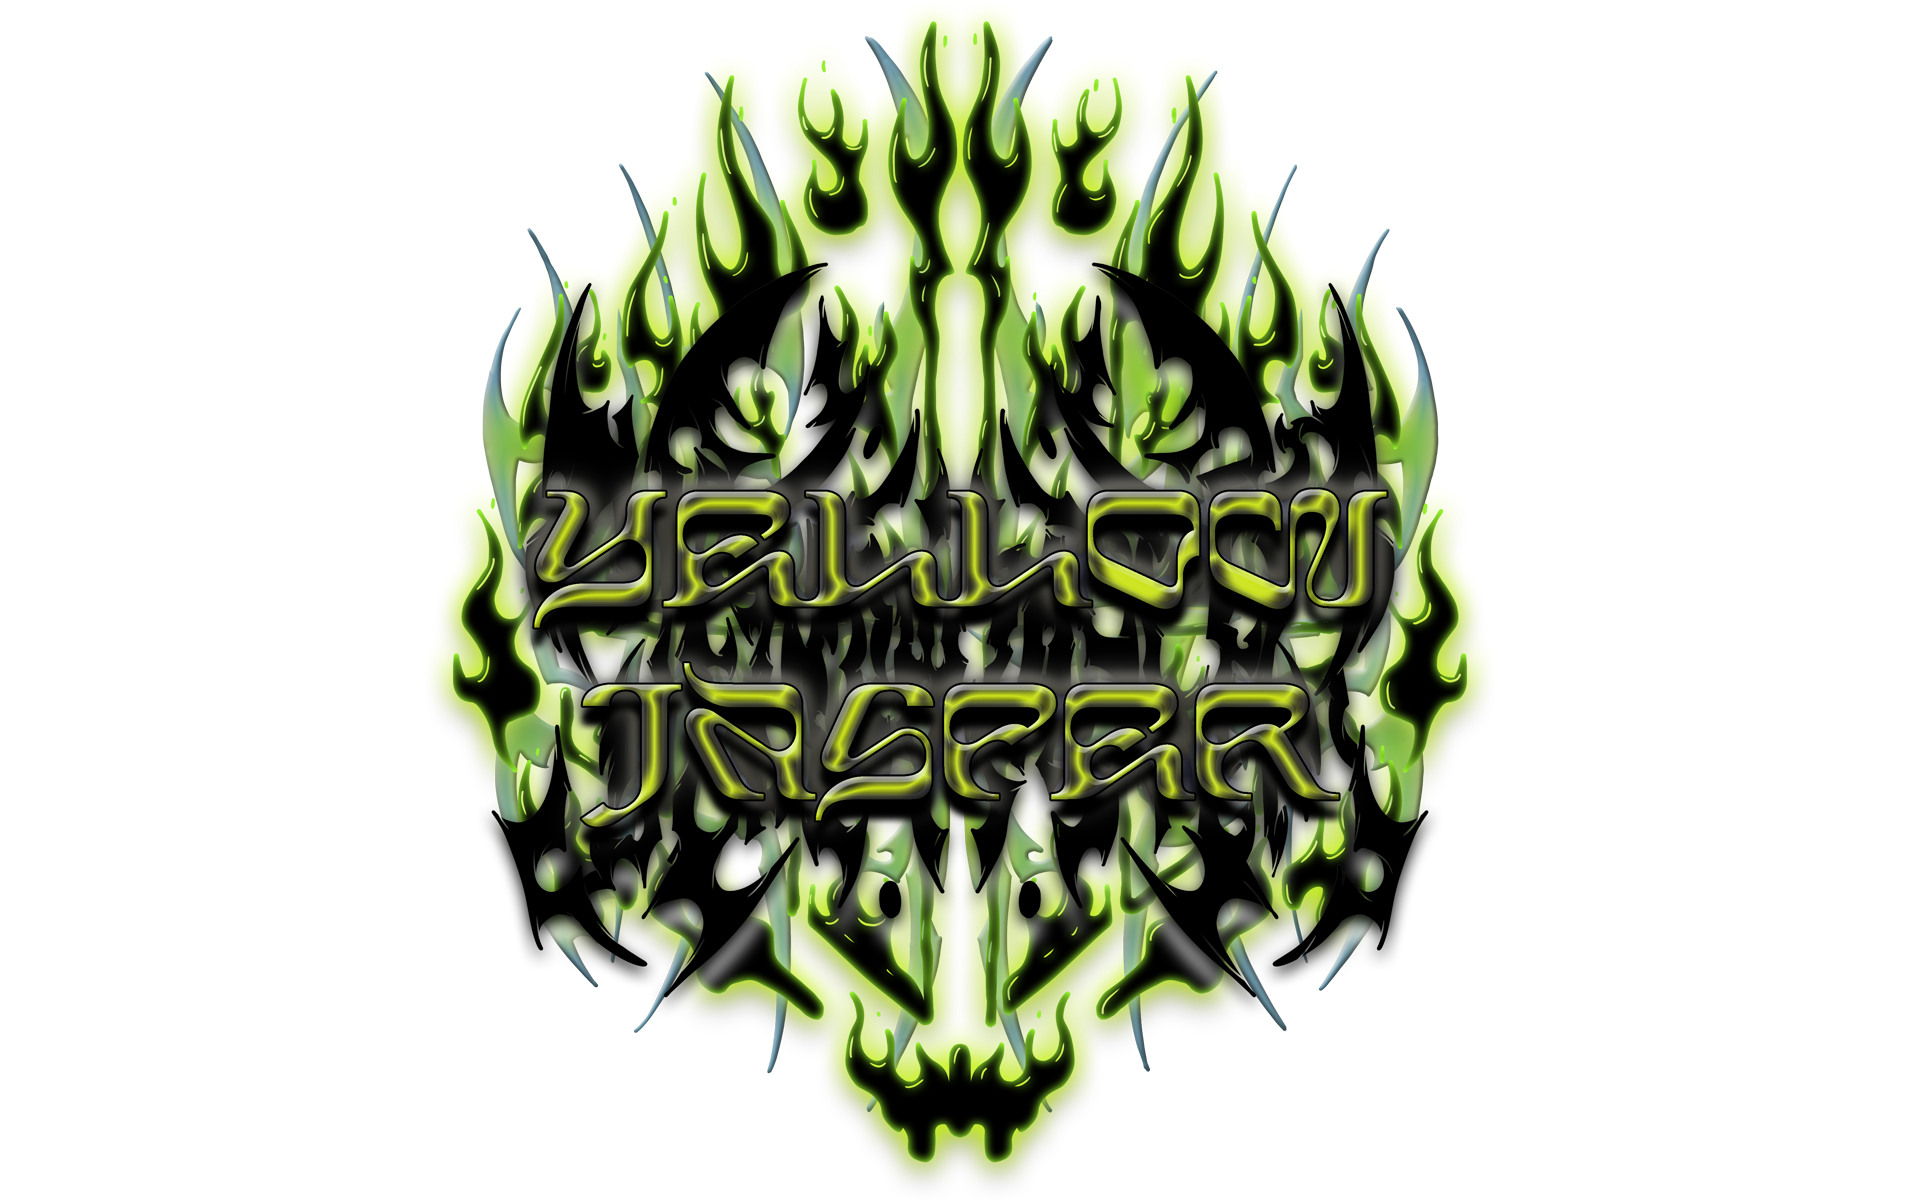 YELLOW-svilova-cover